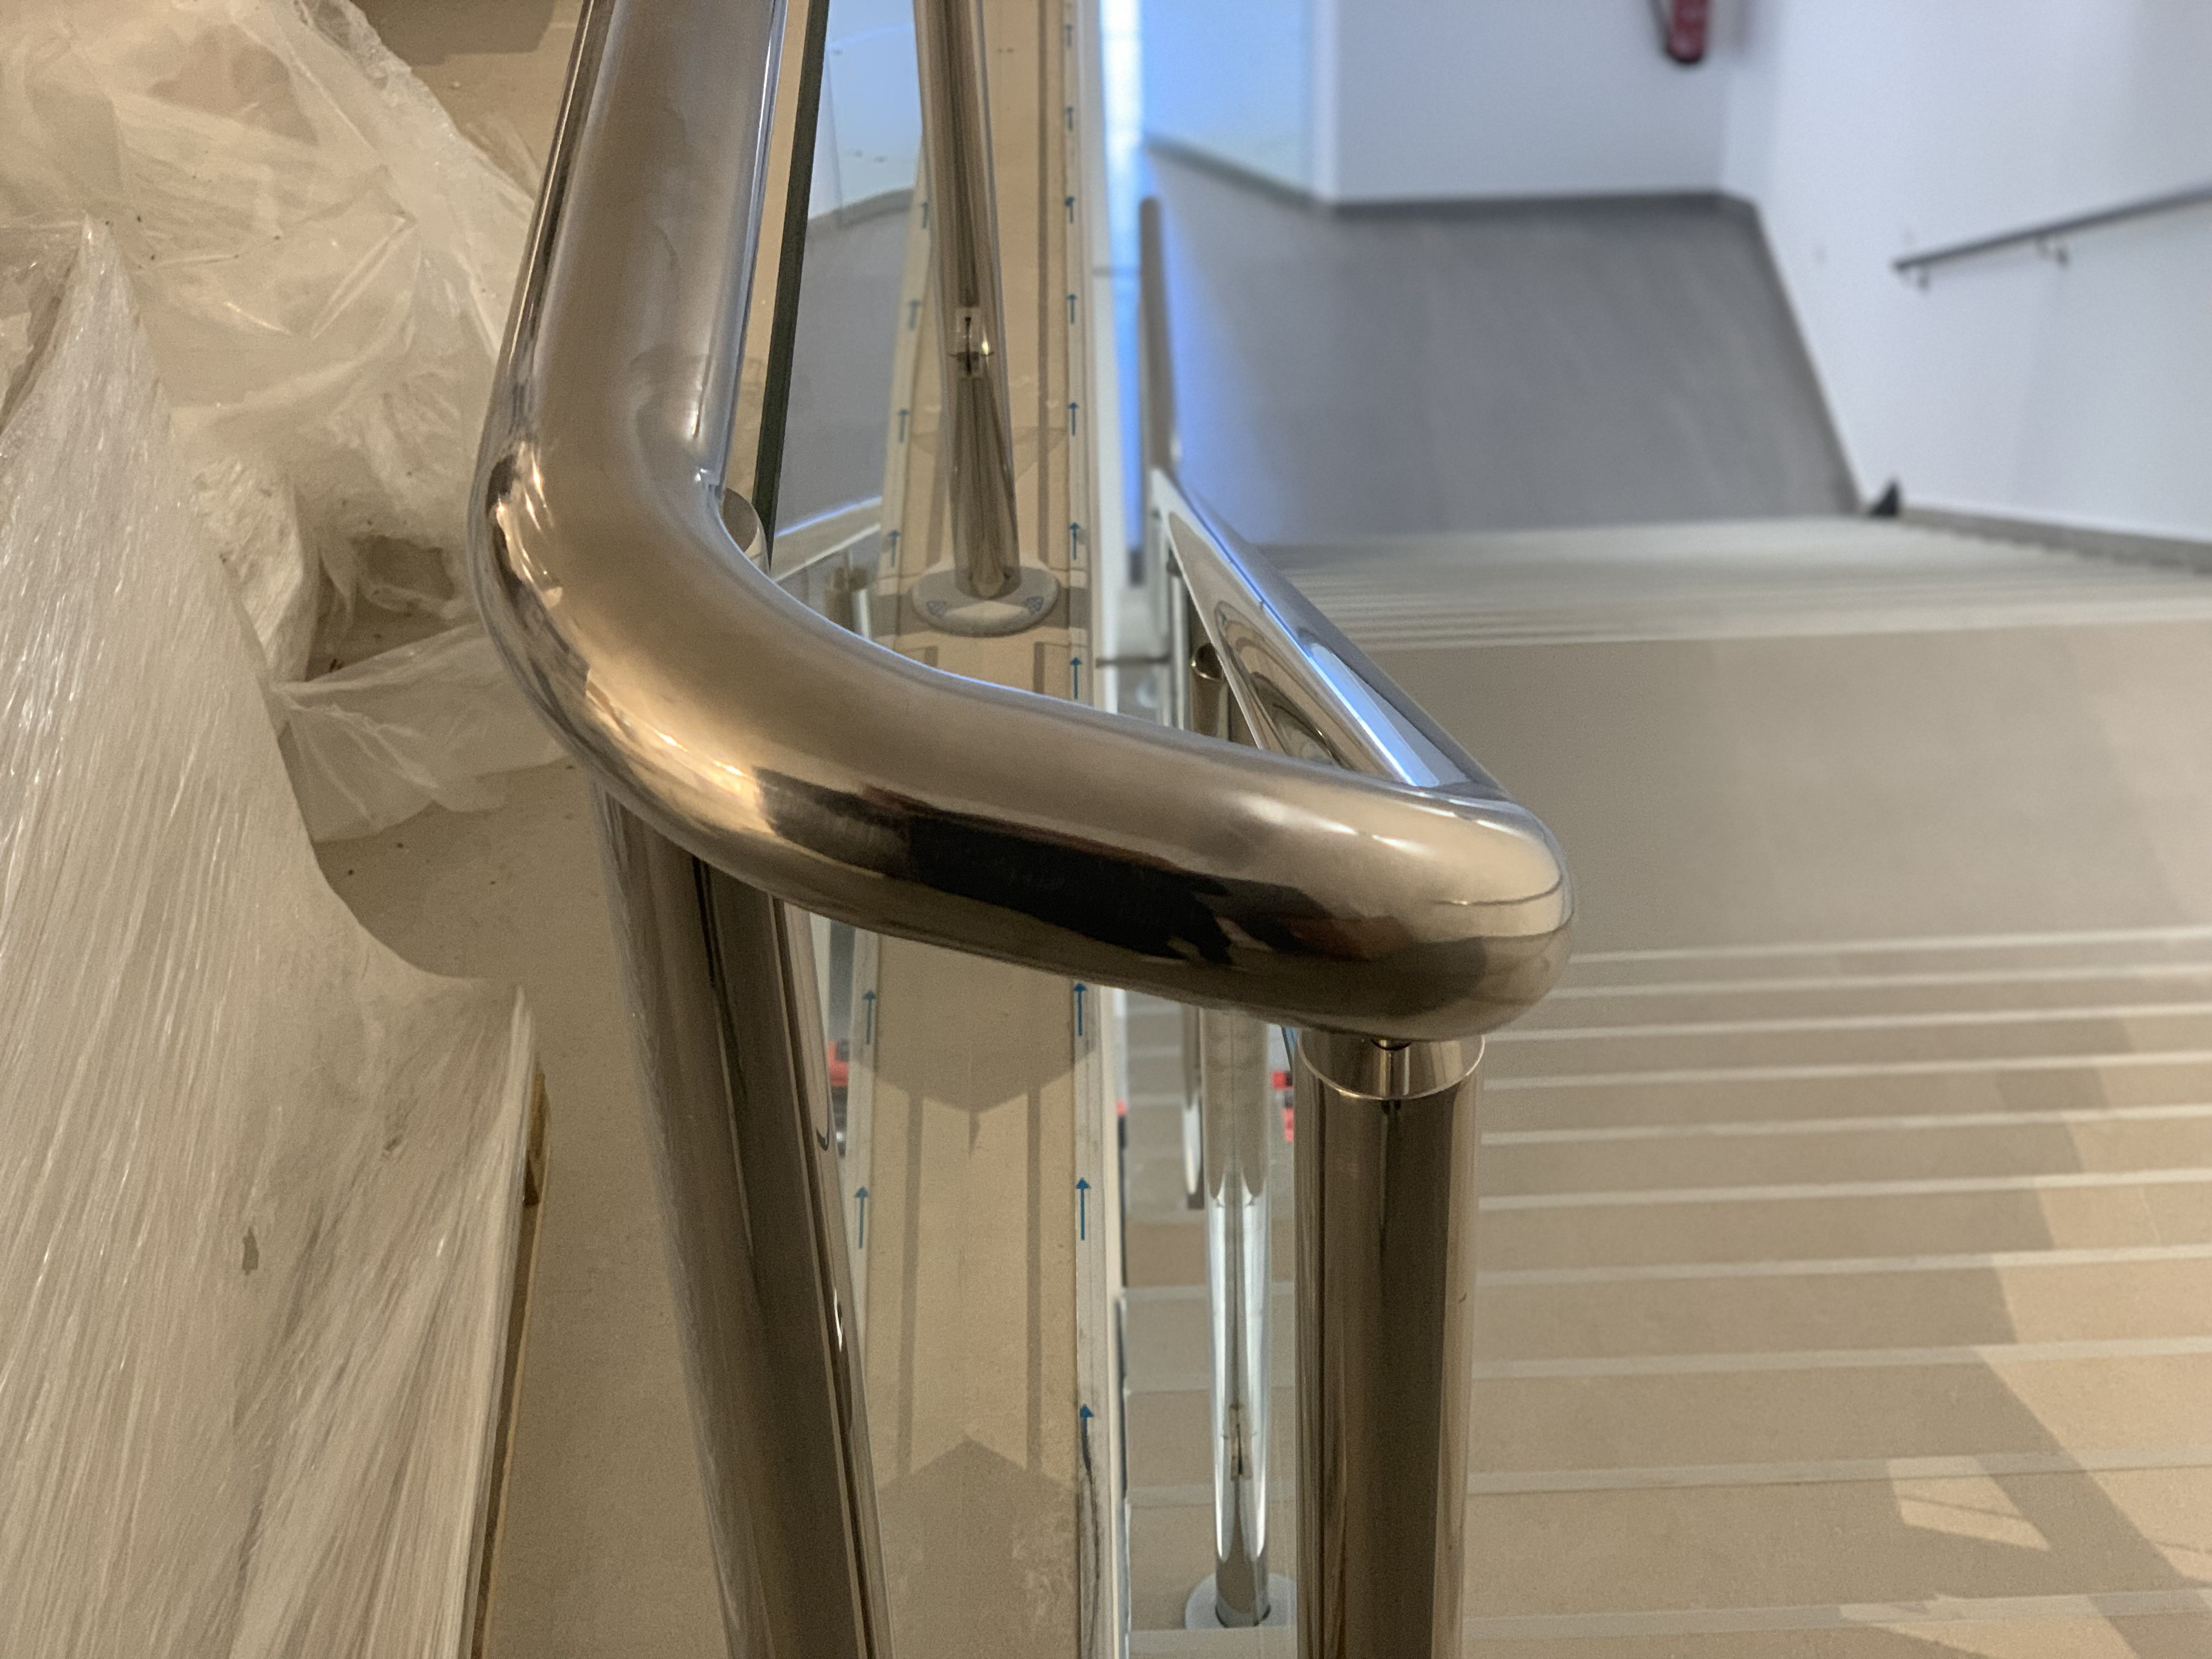 Detalle barandilla de escalera interior edificio